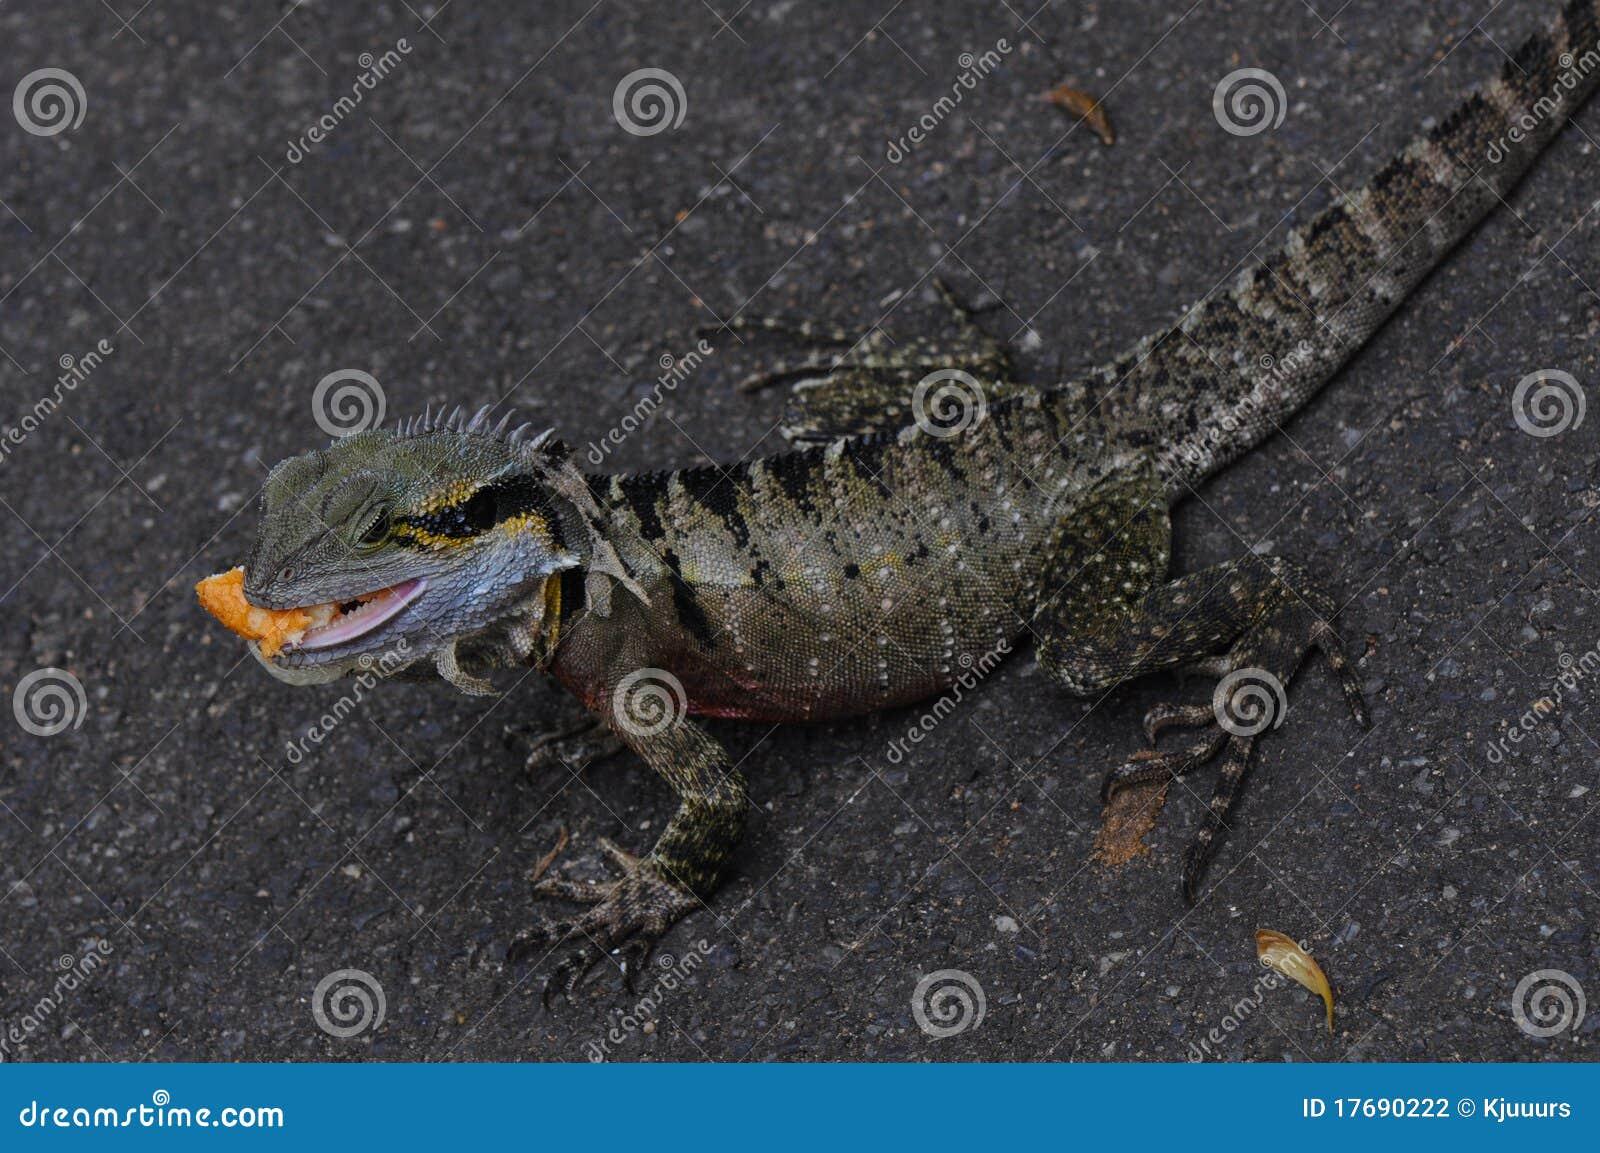 Australian Water Dragon Lizard: Australian Eastern Water Dragon (Lizard) Stock Photography